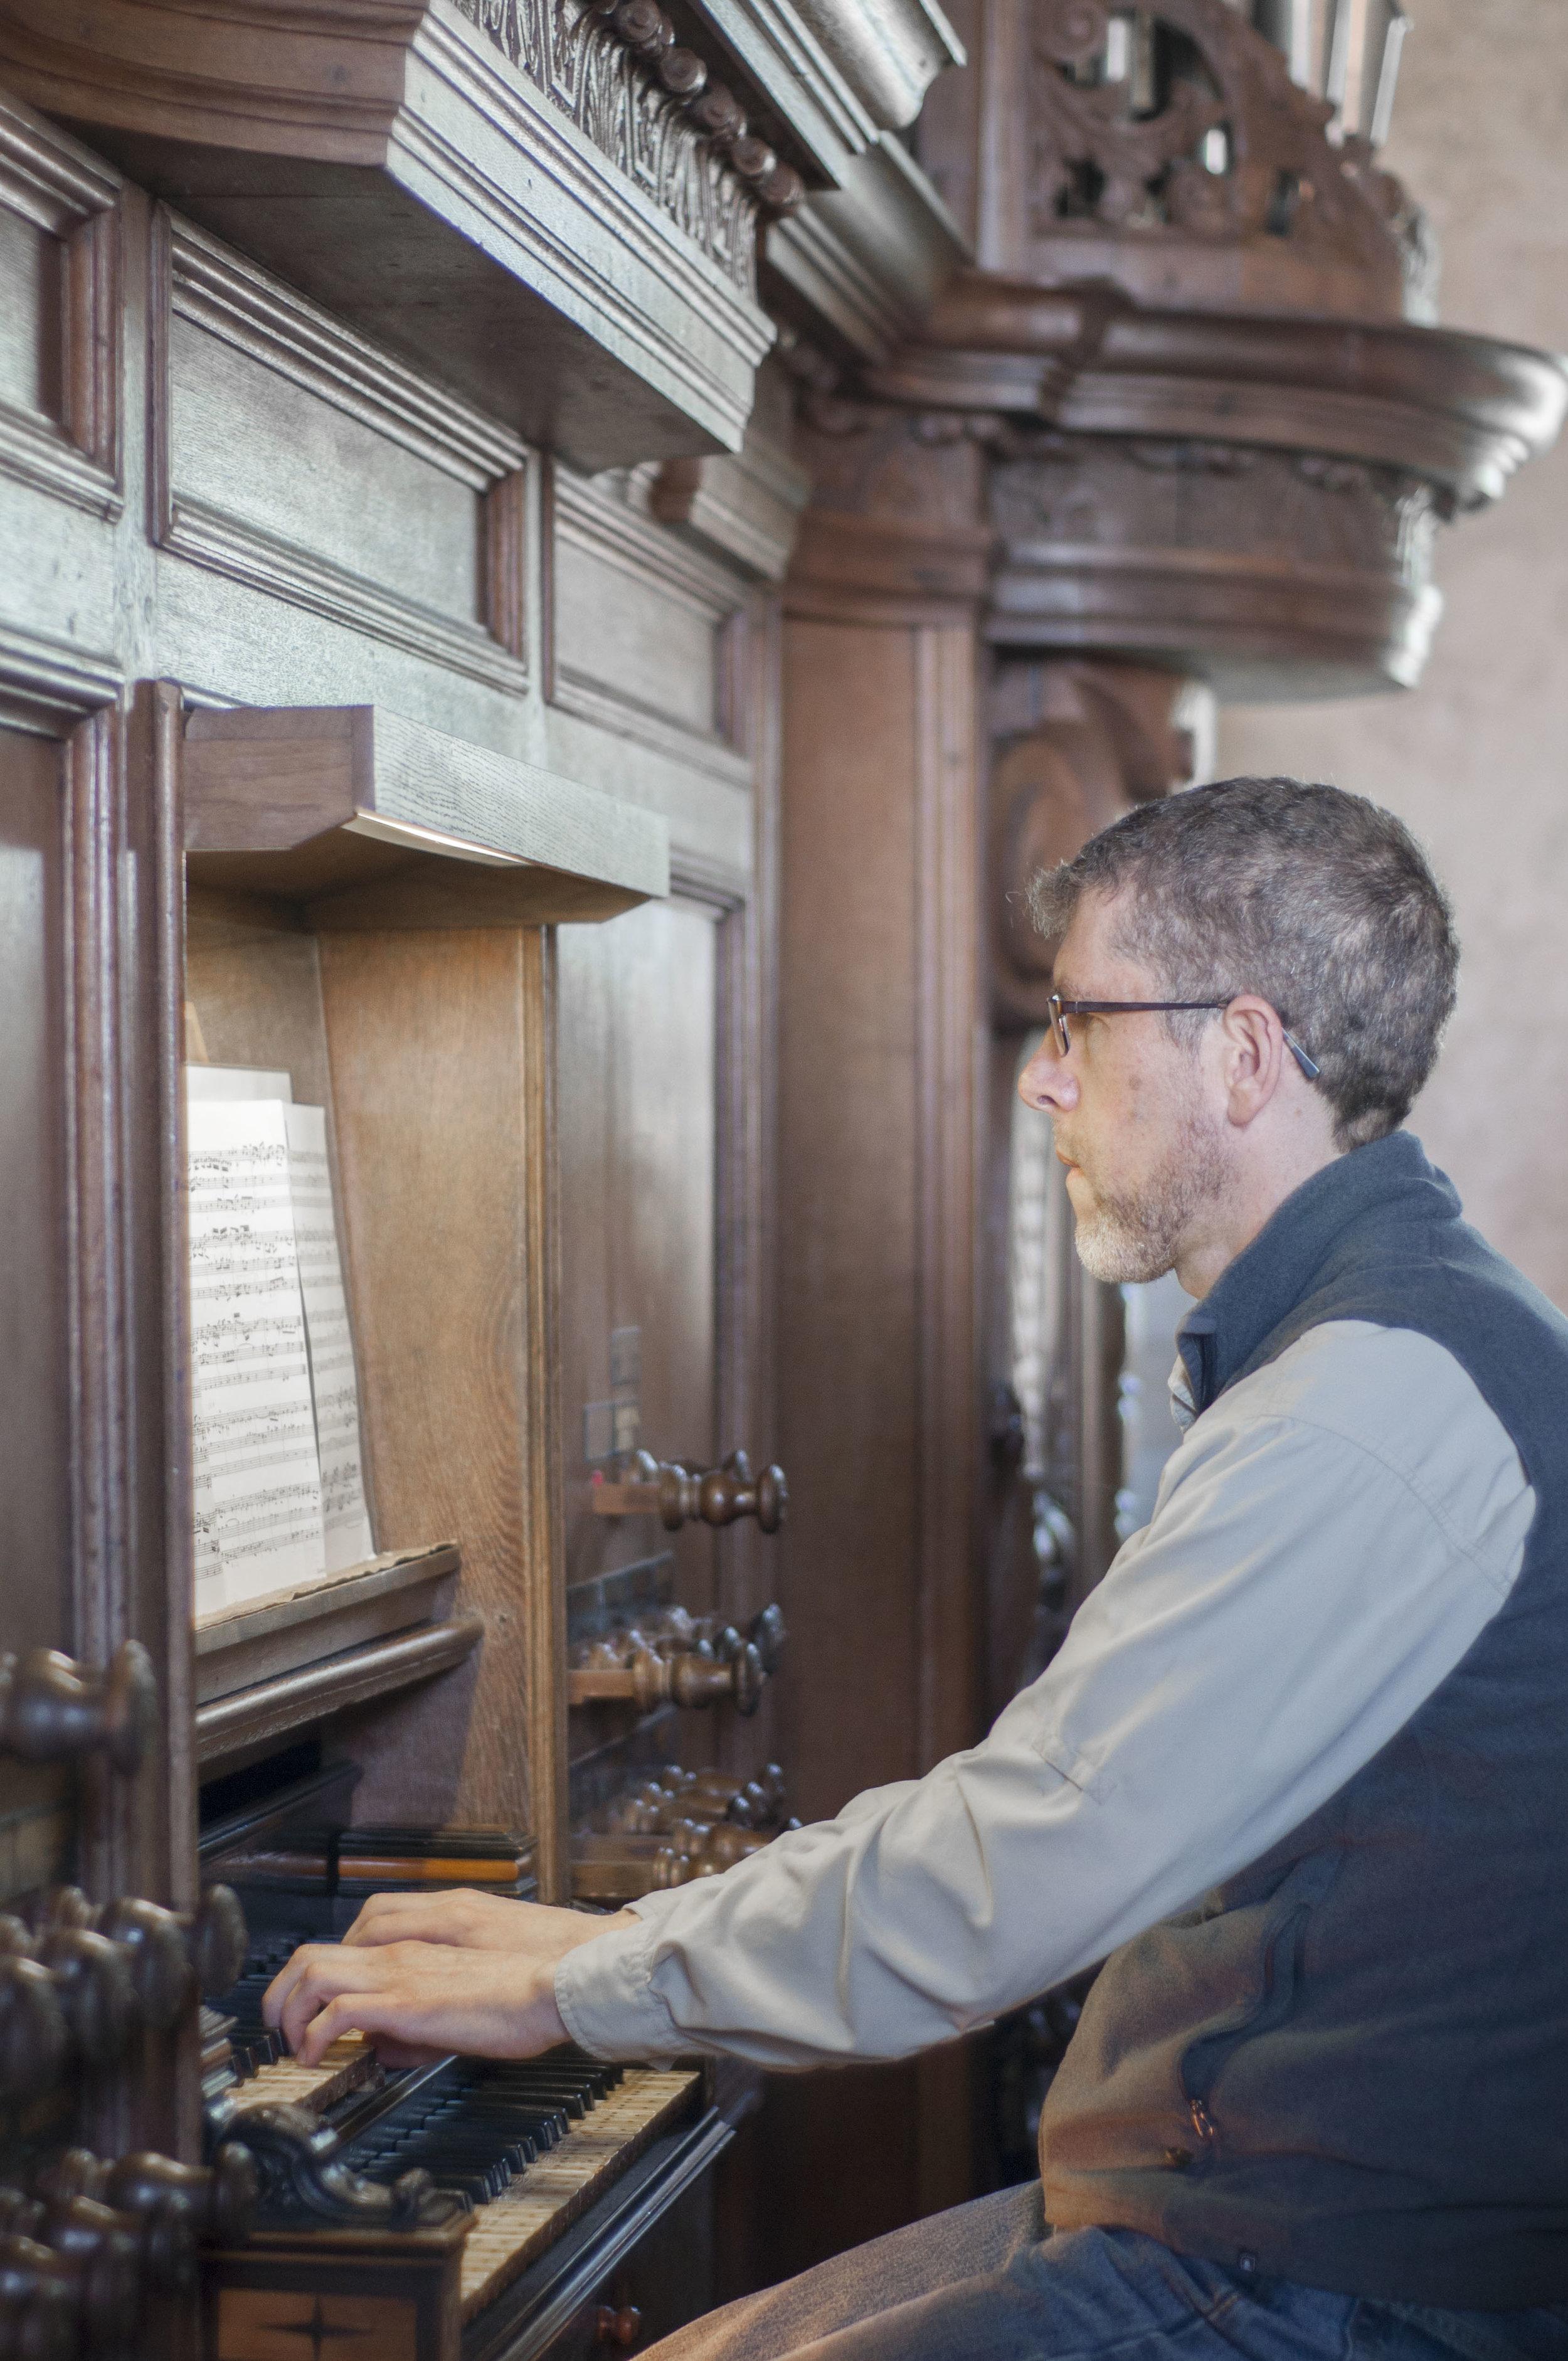 Chris Porter plays the 1733 Hinsz Organ in Leeds, Holland.